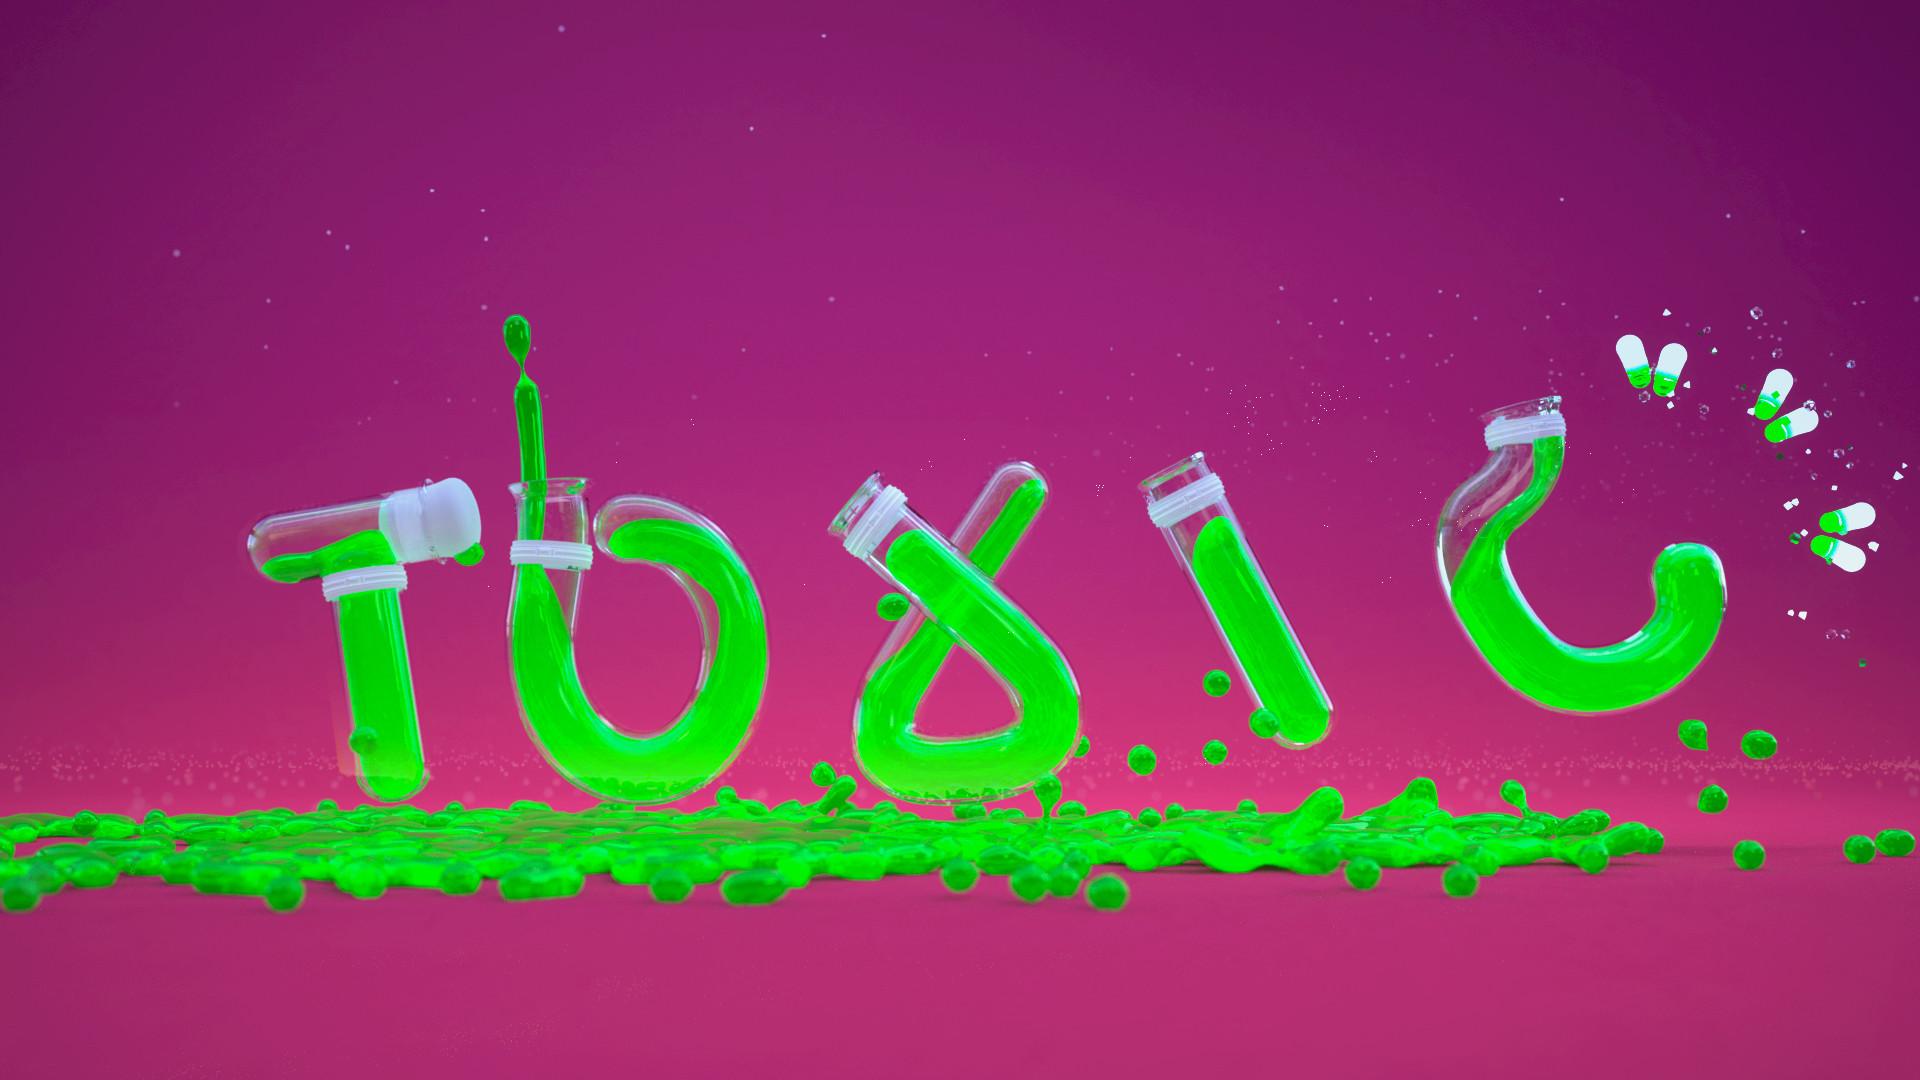 Coen brasser toxicity 2 0 00 03 18